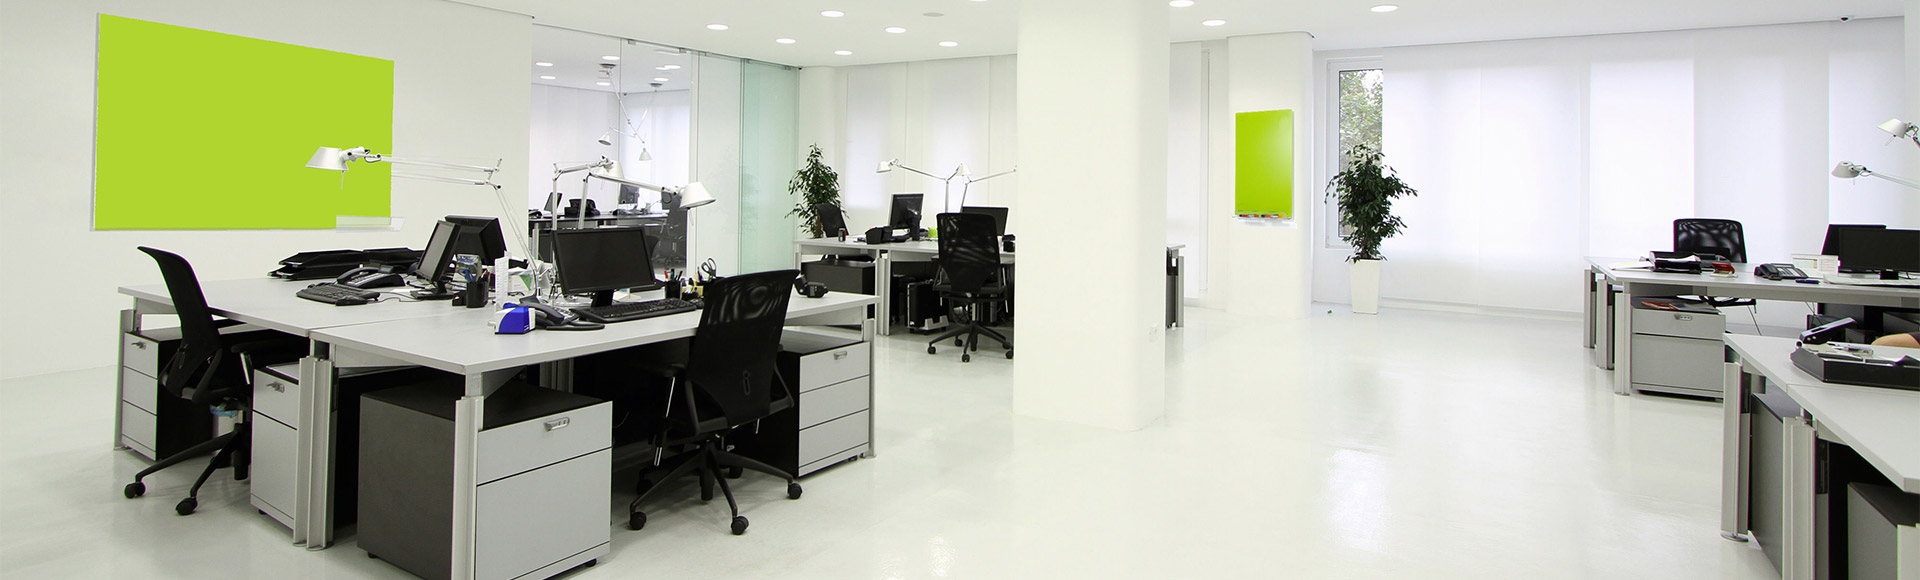 banner-office1